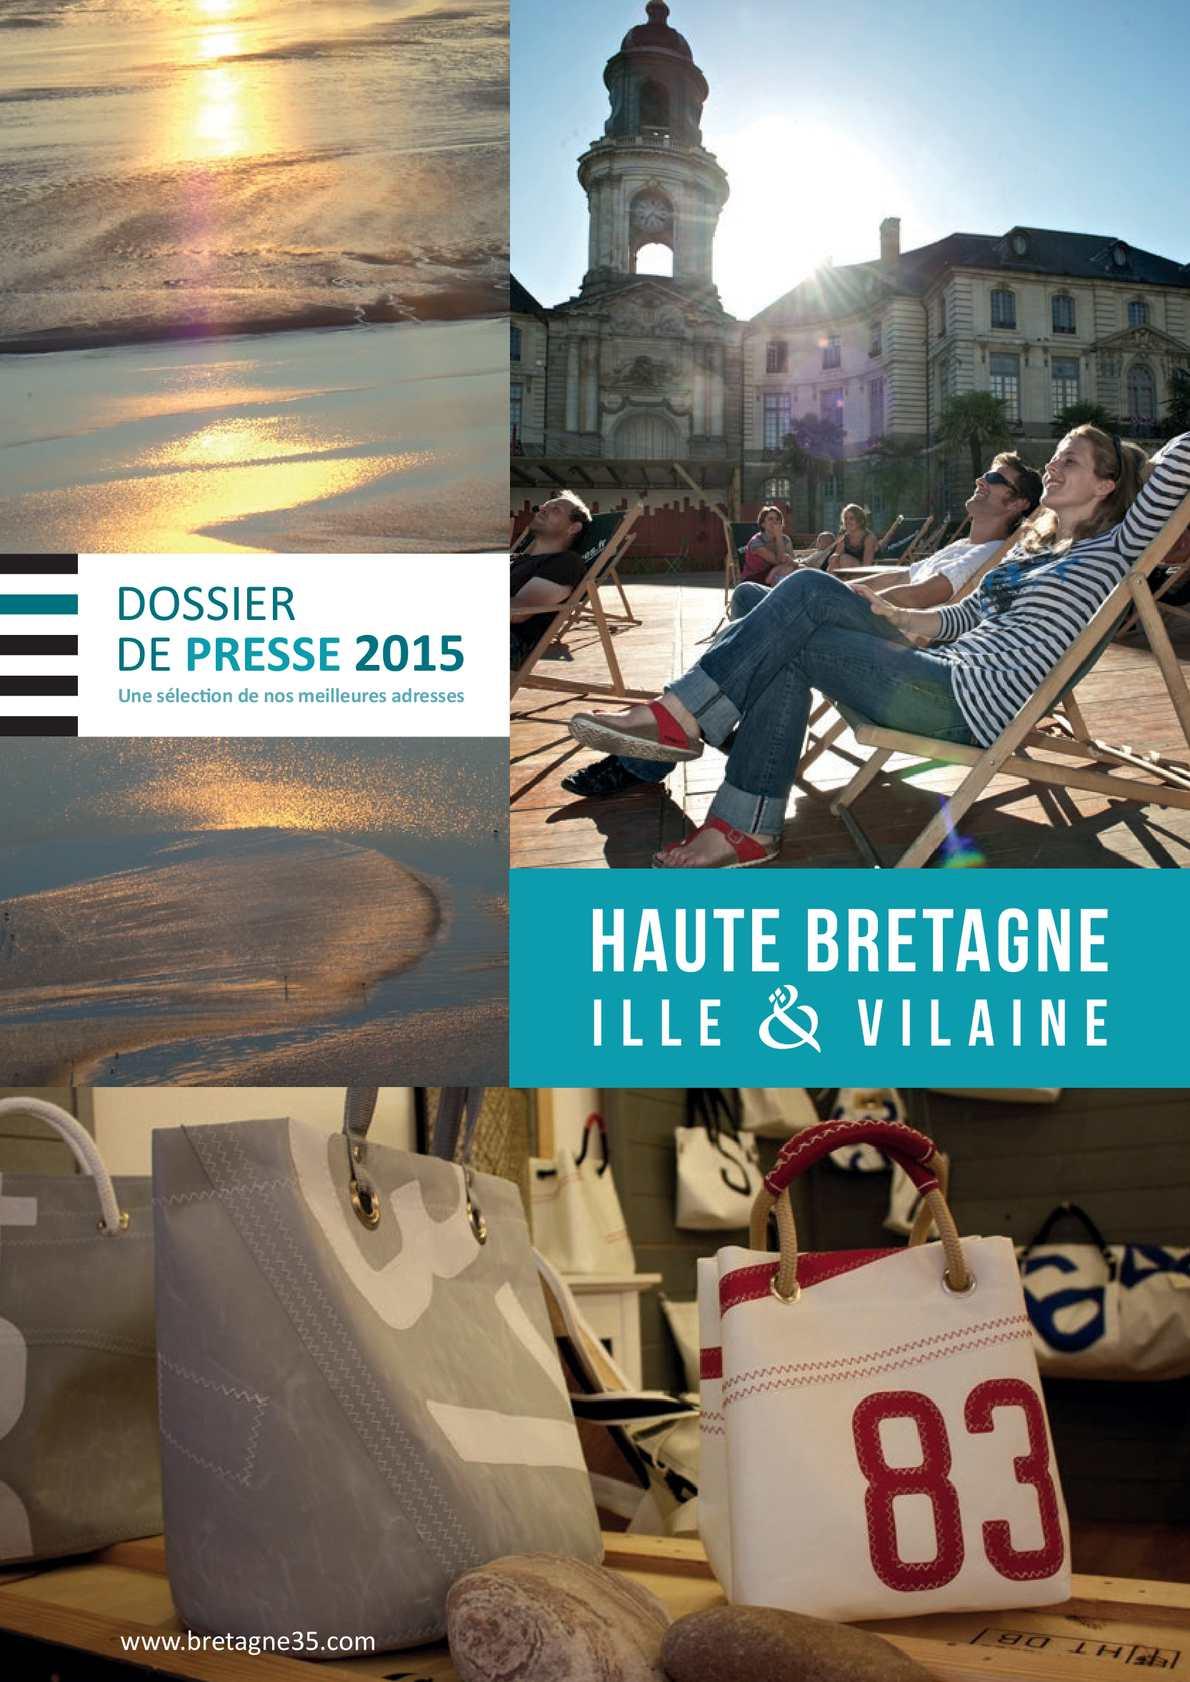 Sophie Pinard La Gacilly calaméo - dossier de presse haute bretagne 2015